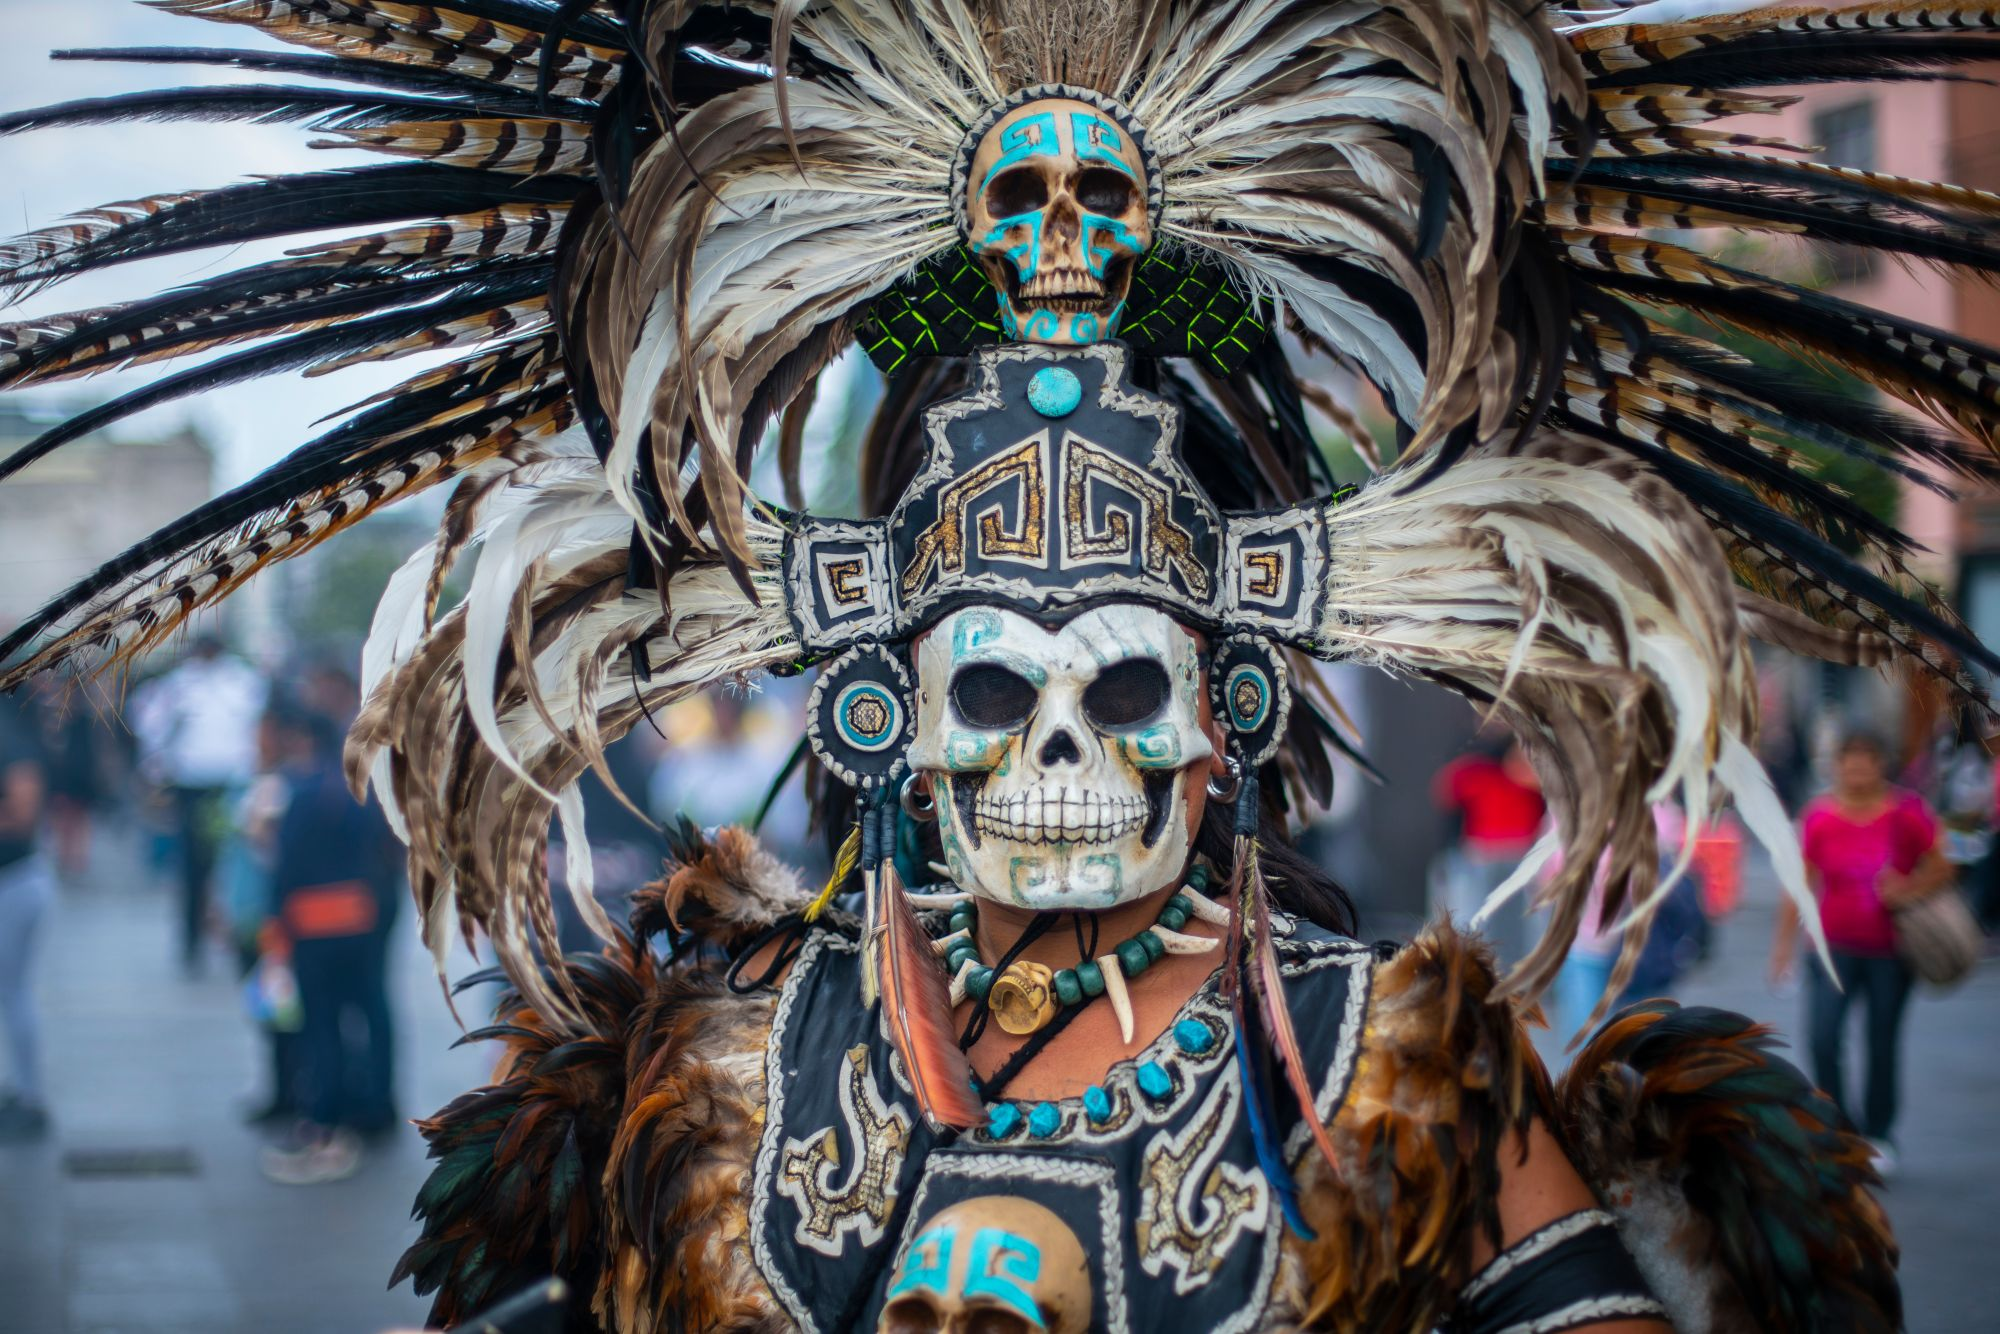 Maska w Meksyku